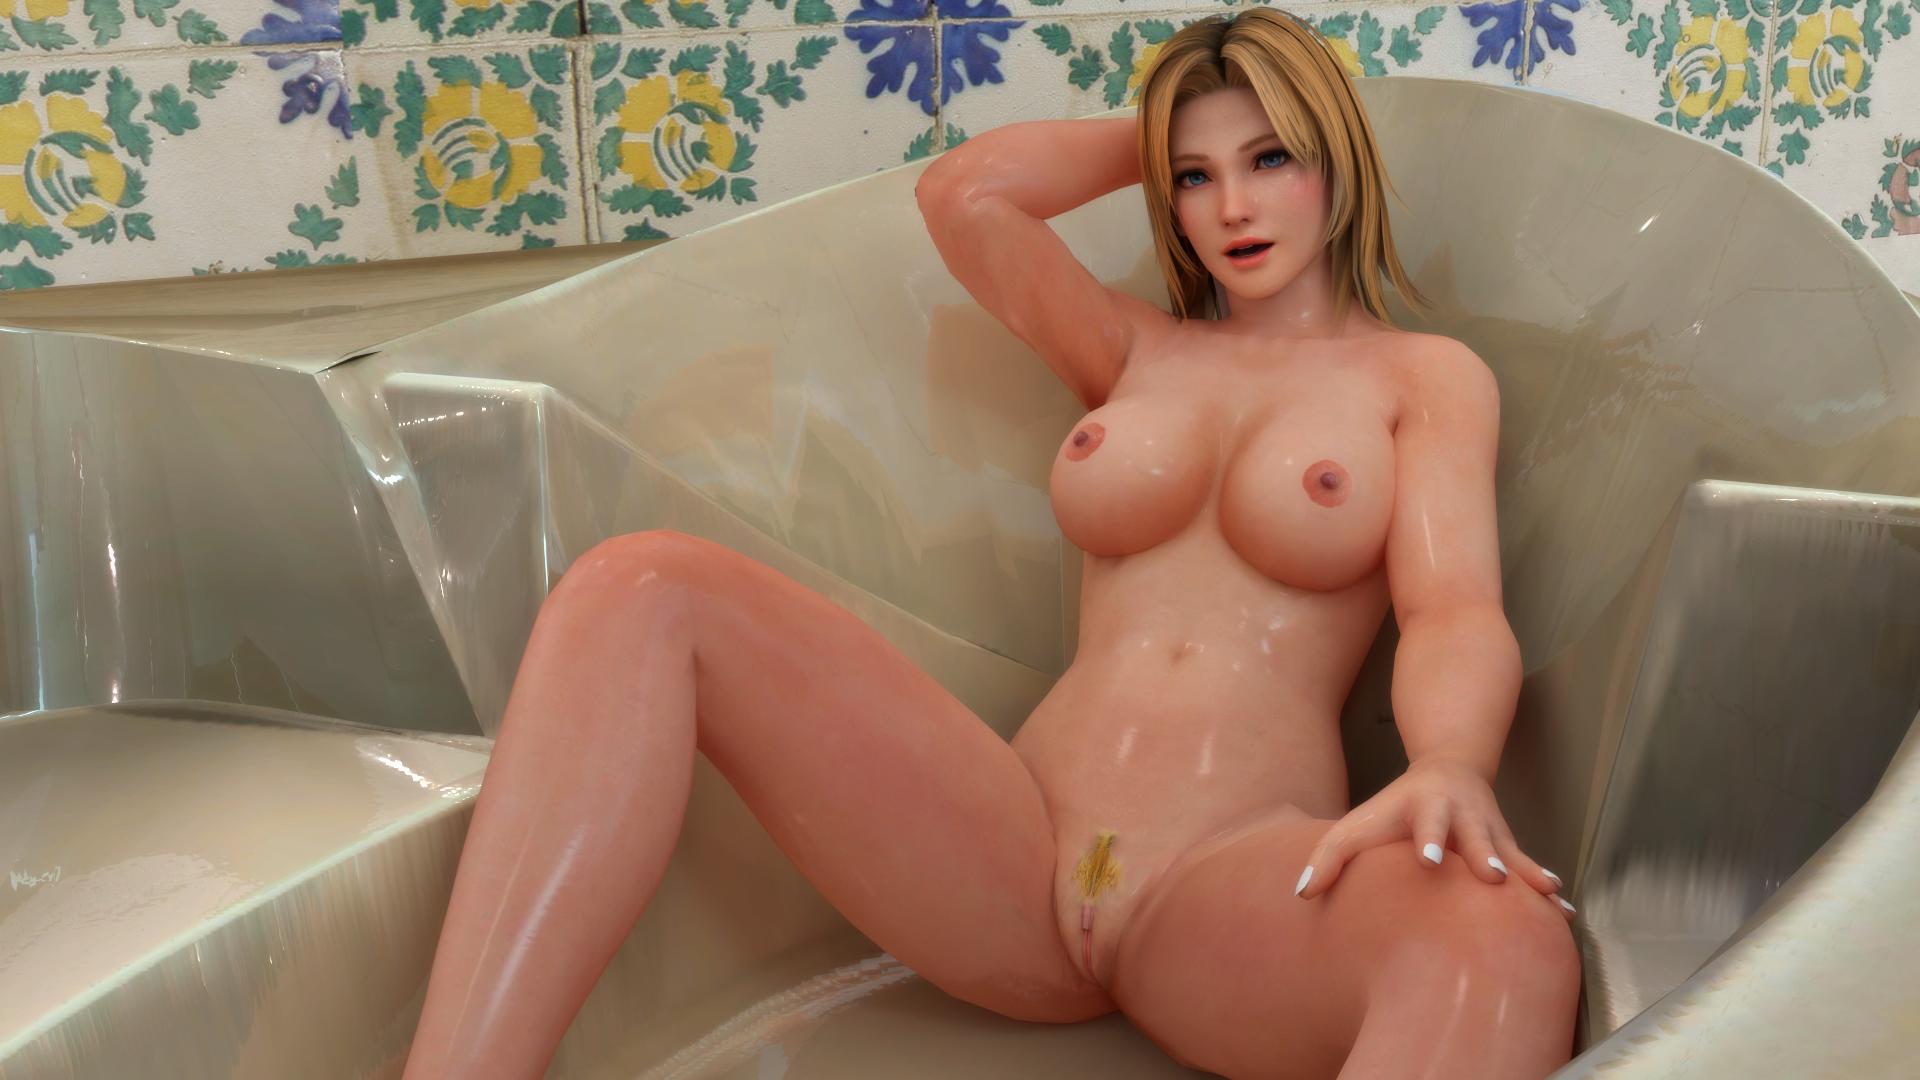 Doa girls xxx nude pics nackt video